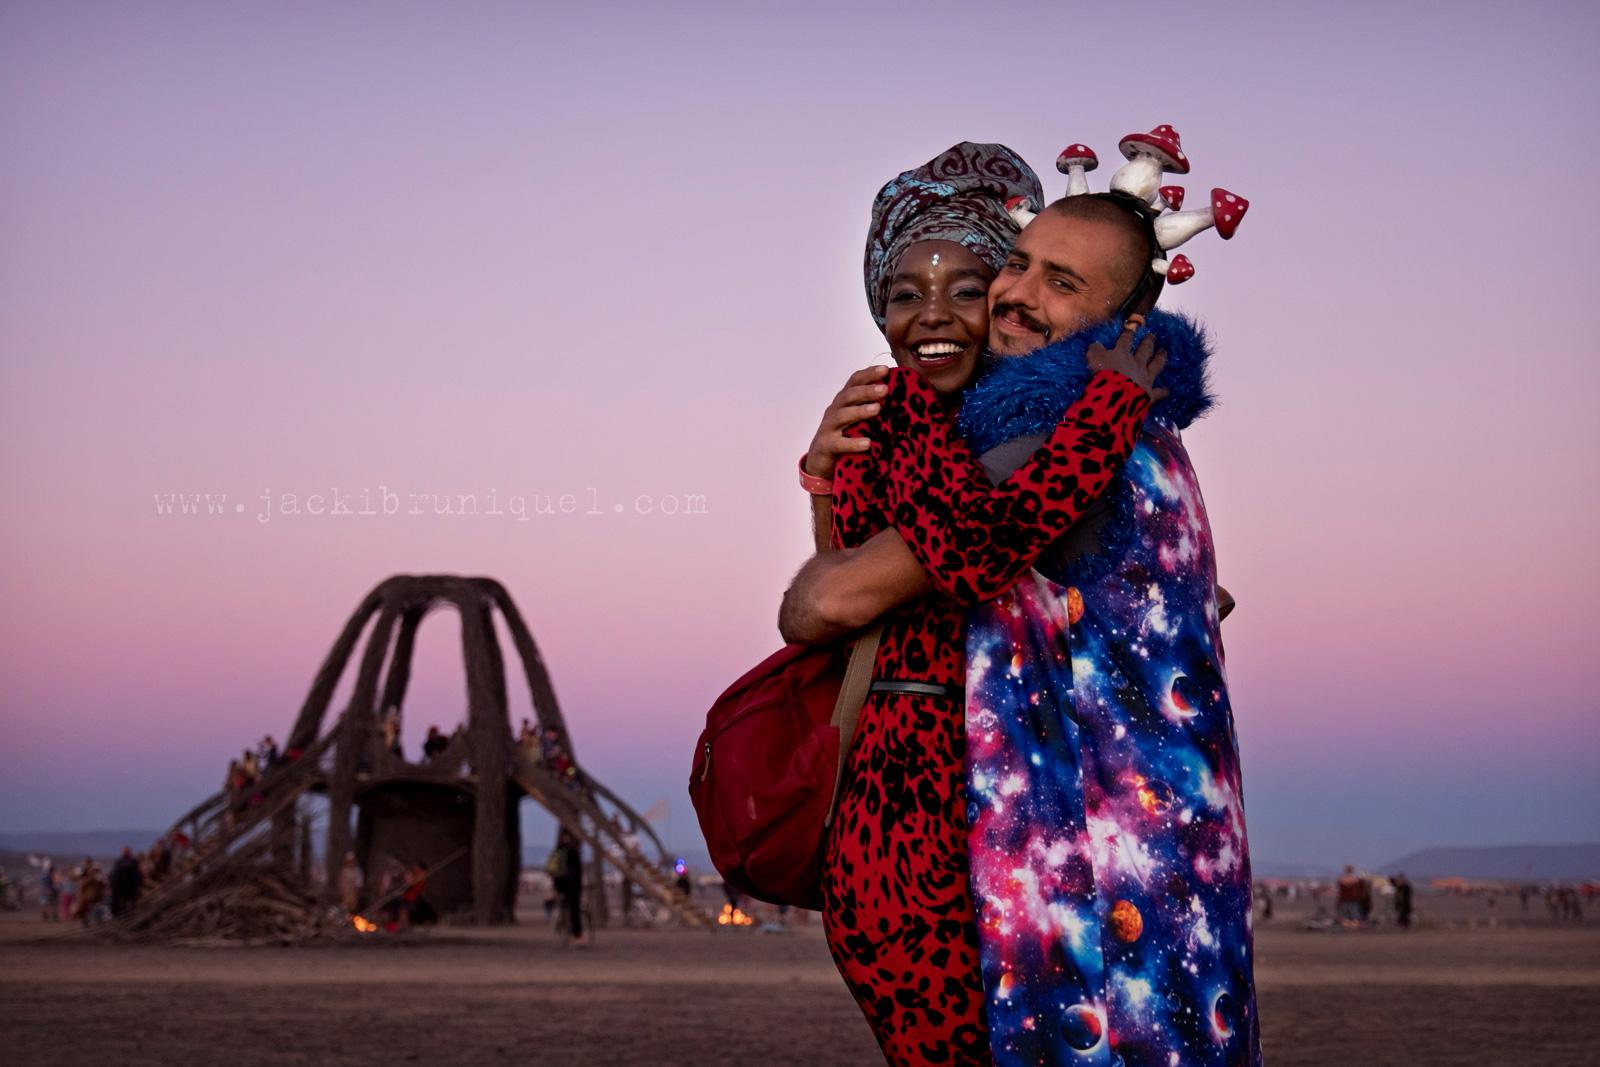 Afrika-Burn-2016-Creative-South-African-Photographer-Jacki-Bruniquel-031.jpg